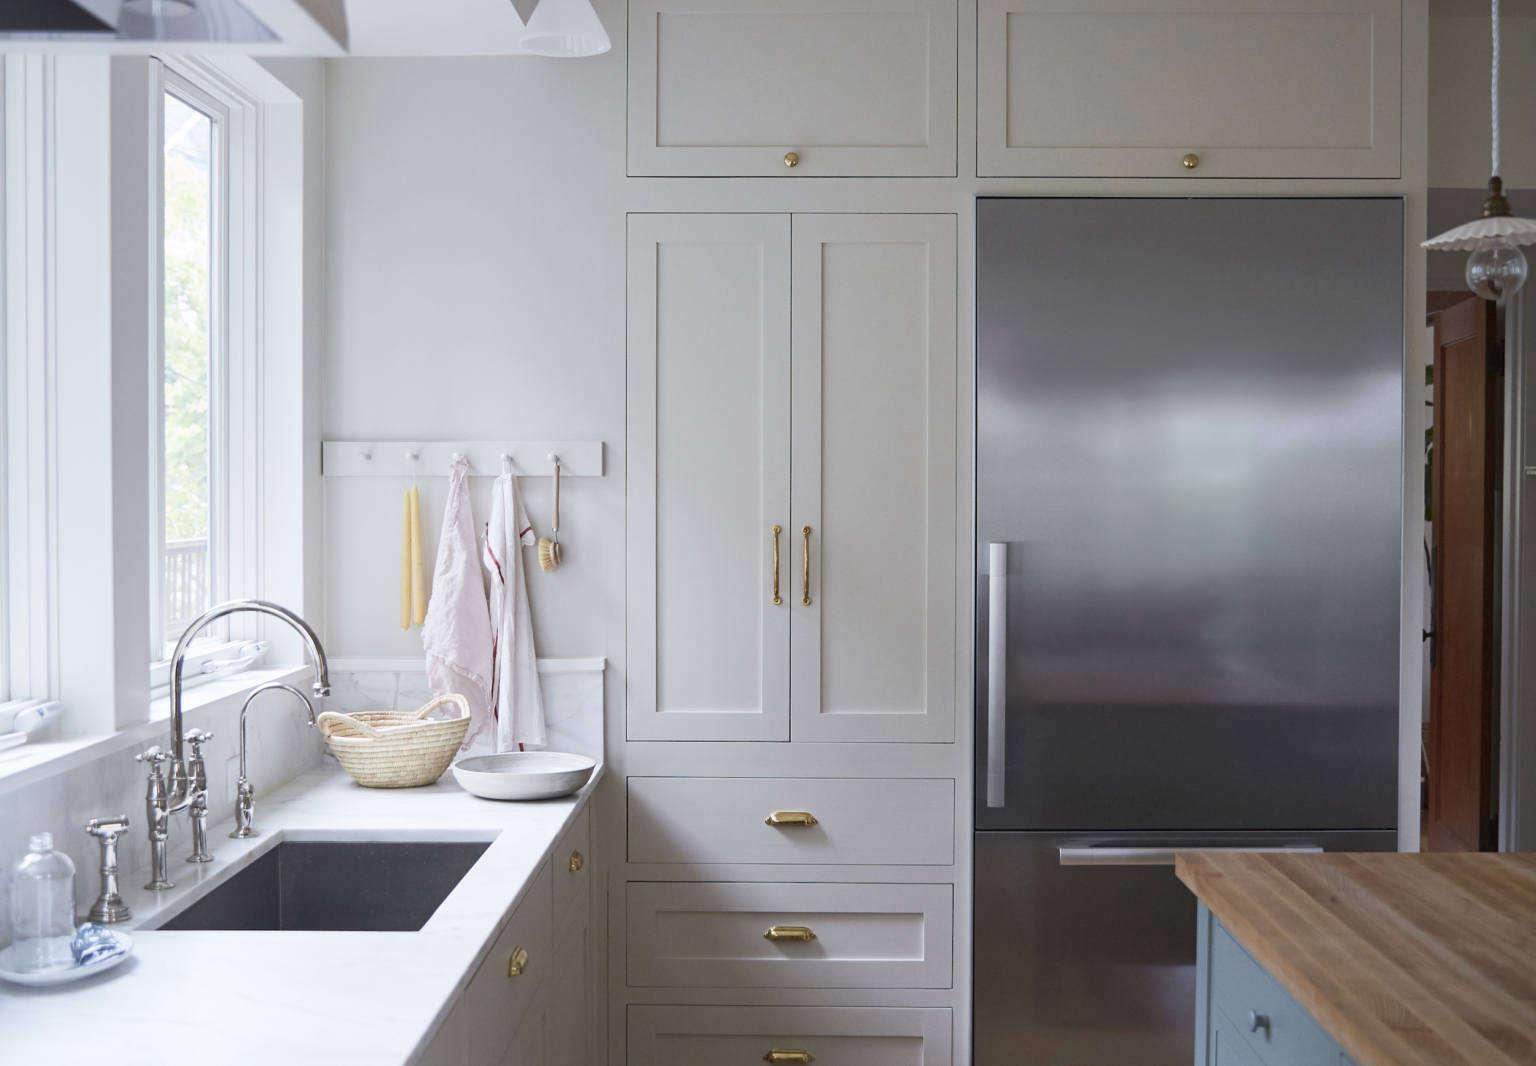 katie hackworth aran goyoaga seattle kitchen fridge